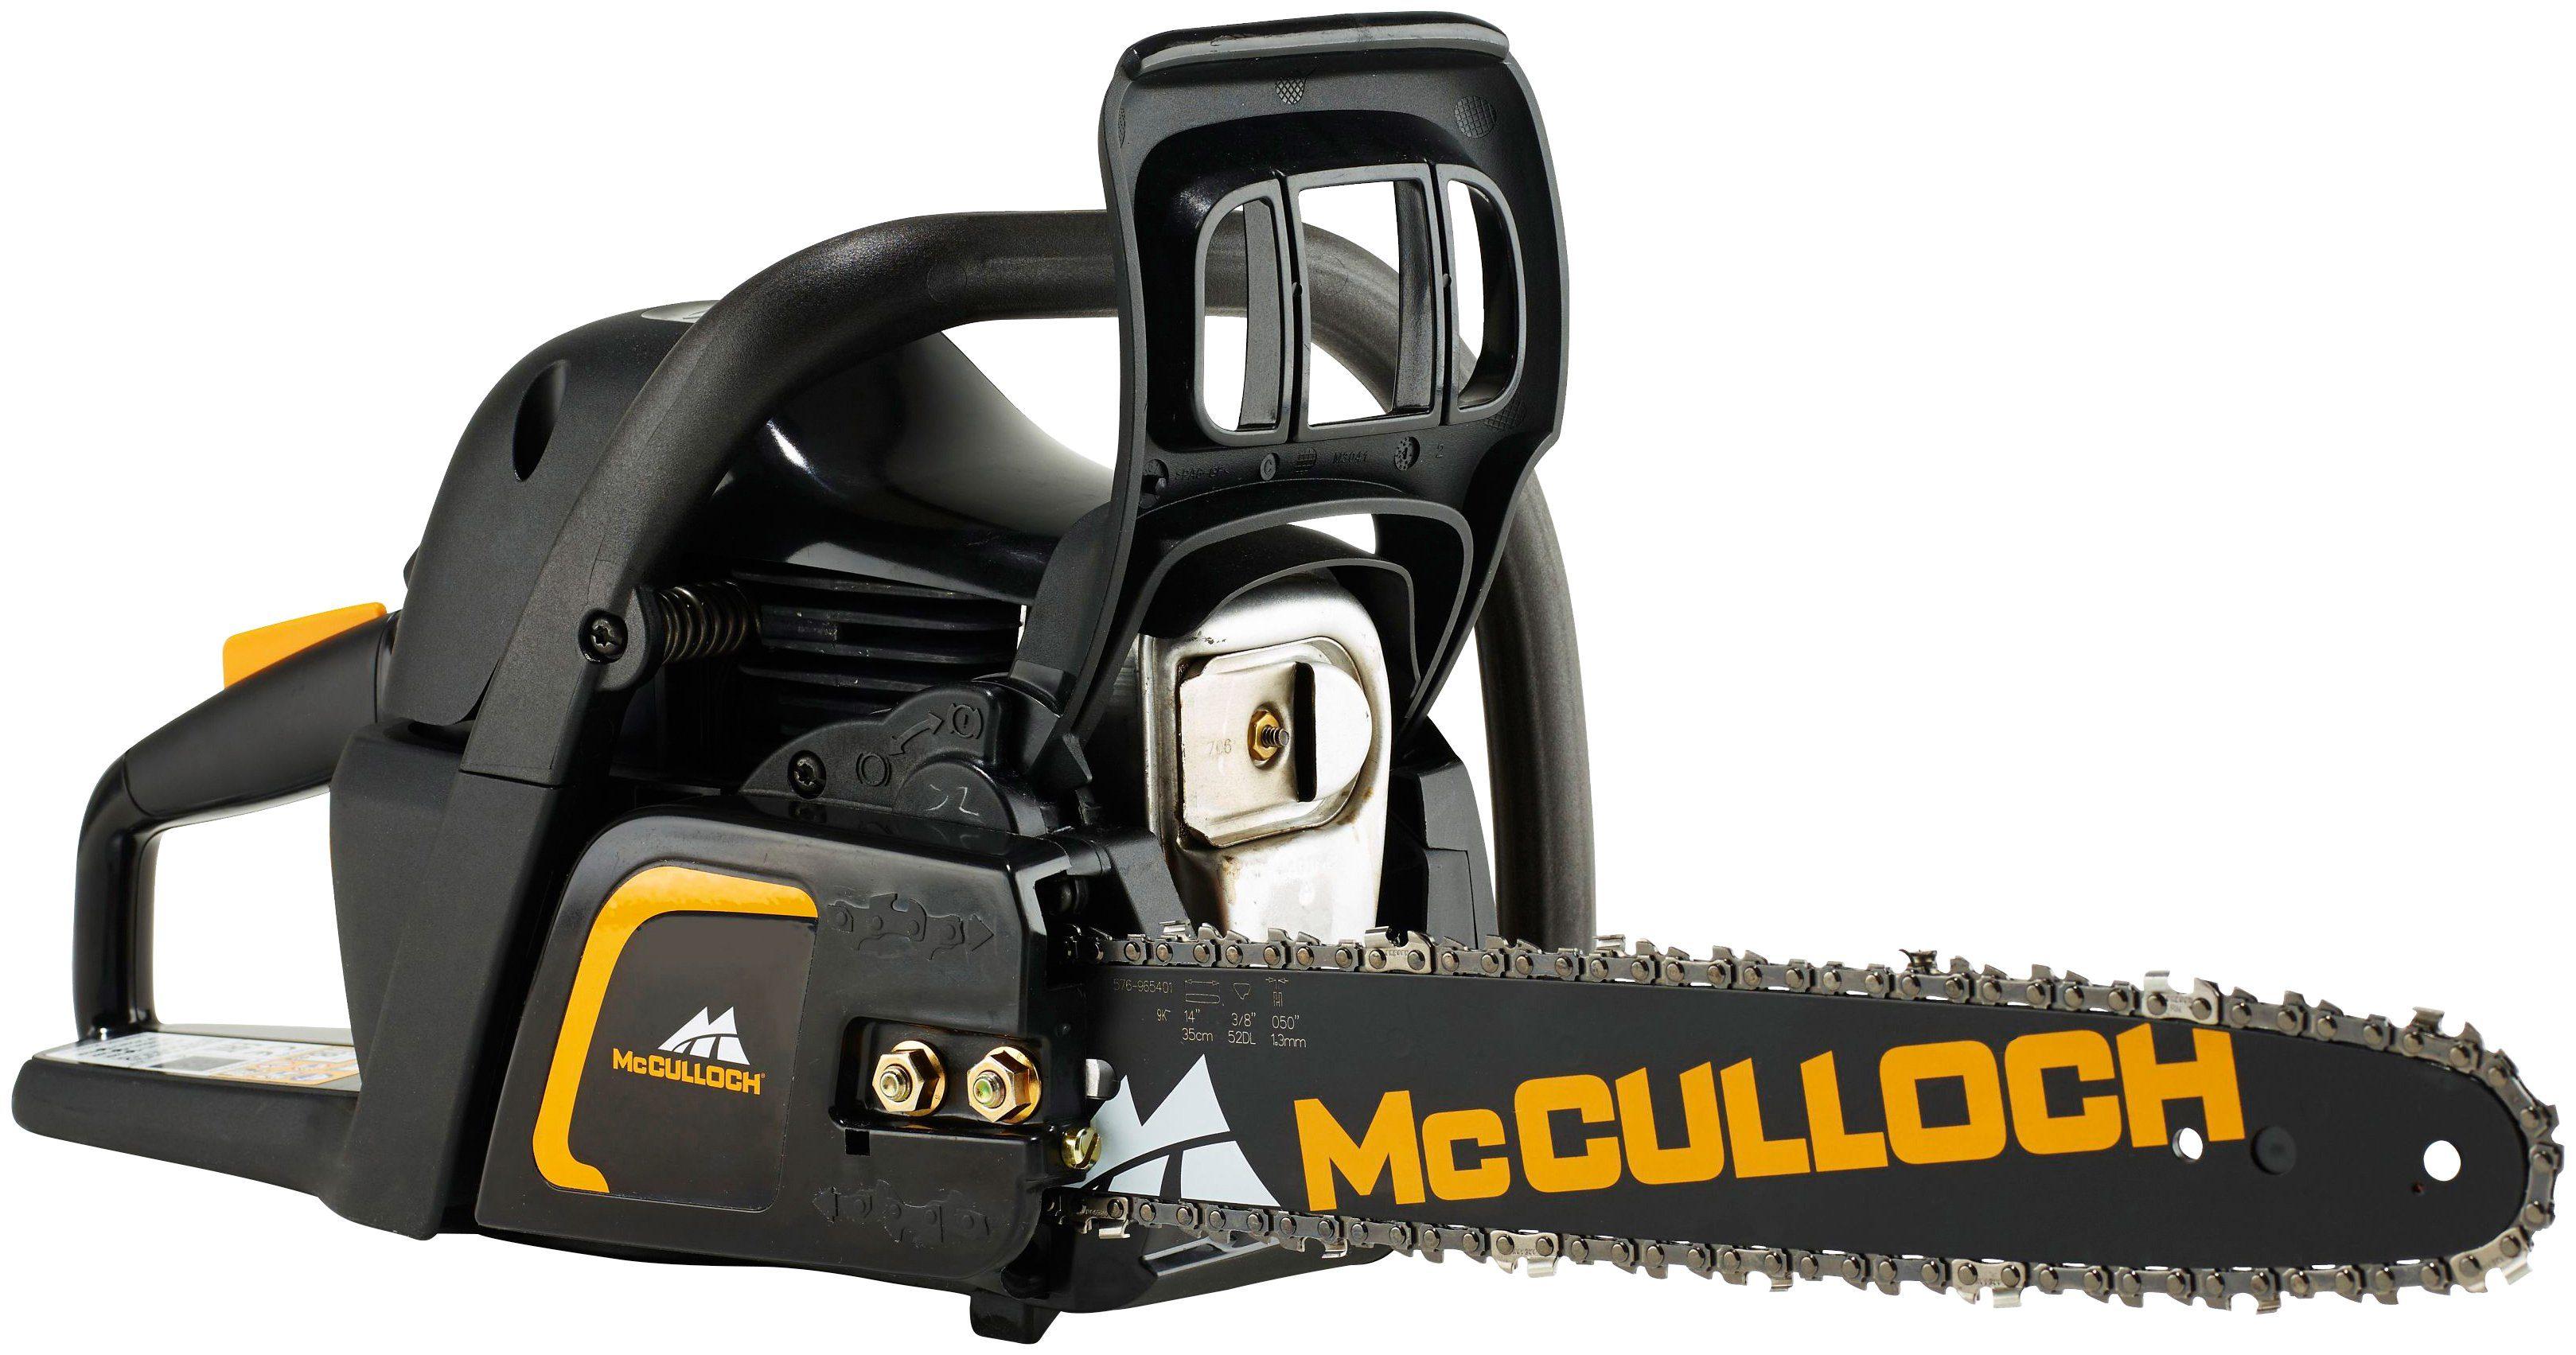 MCCULLOCH Benzin-Kettensäge »CS 42 S«, 35 cm Schwertlänge